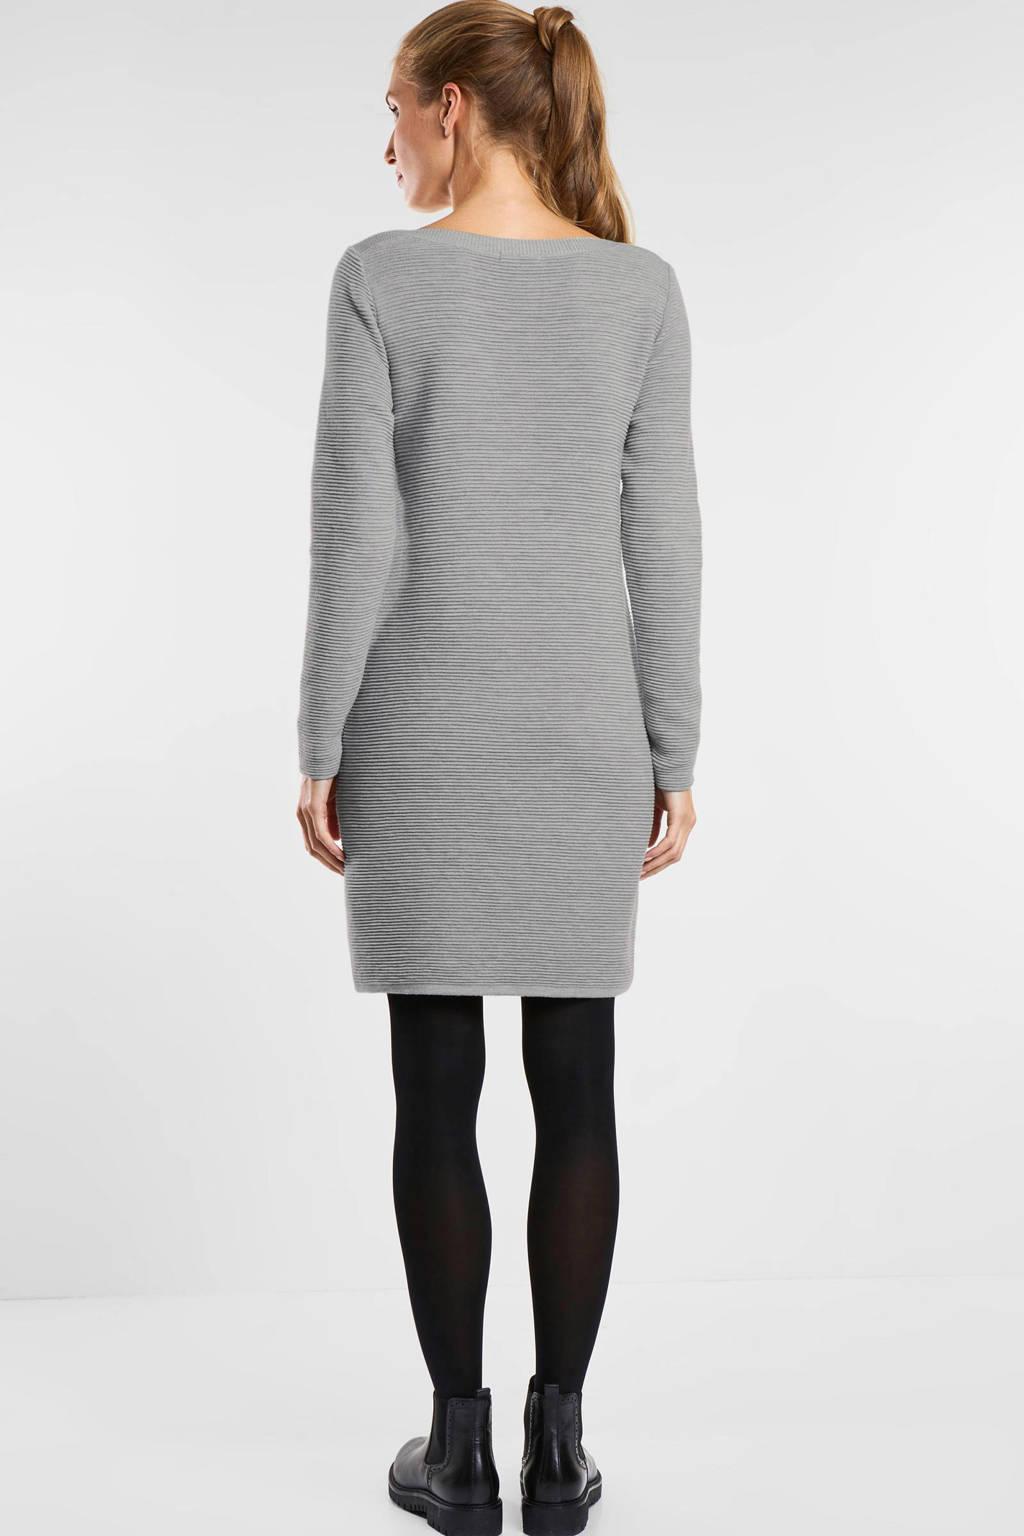 CECIL ribgebreide jurk grijs, Grijs